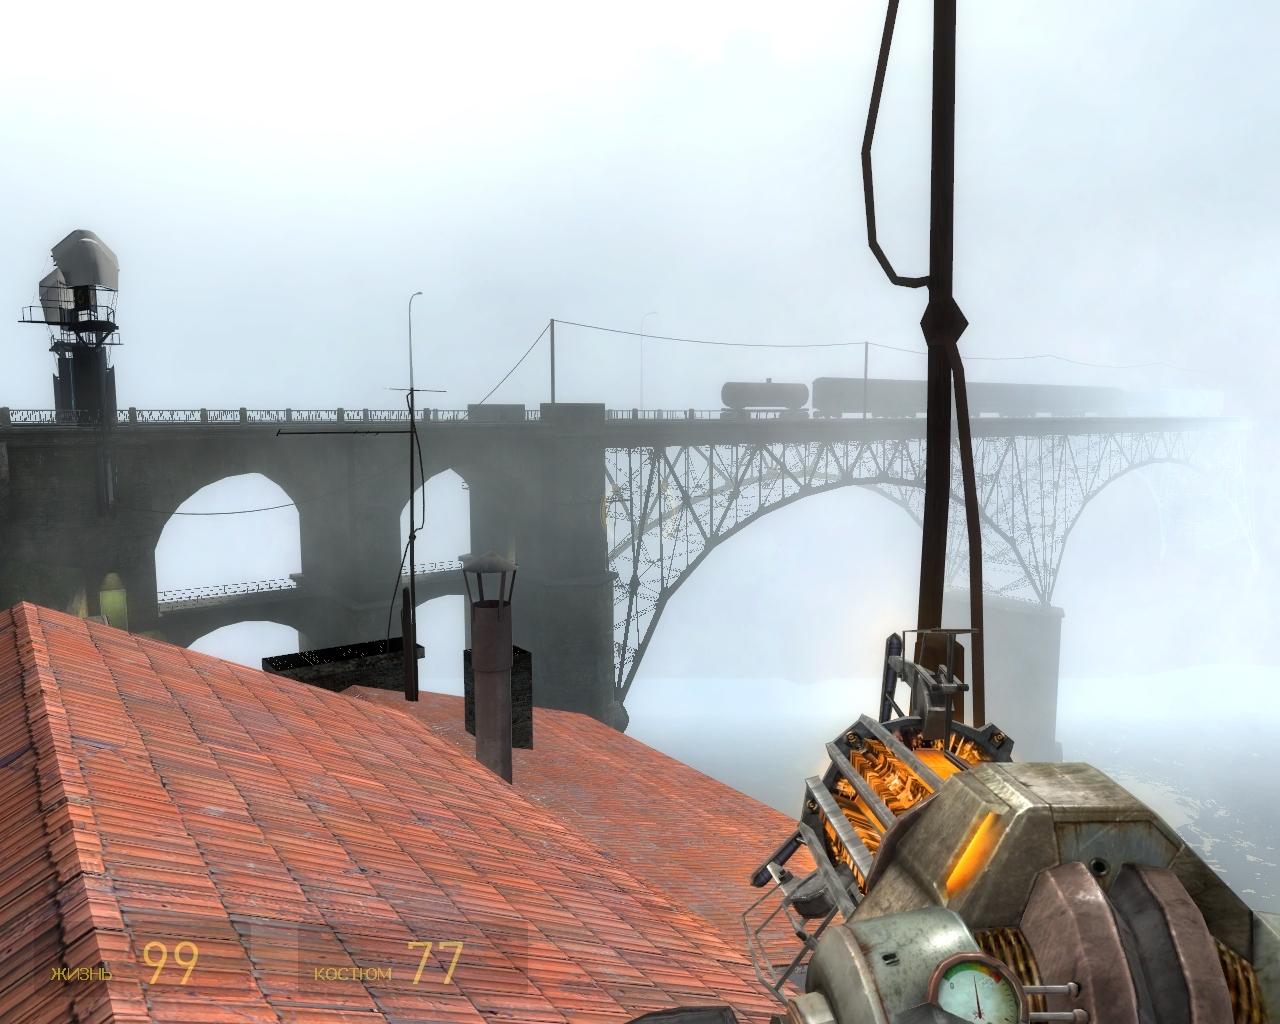 d2_coast_070013.jpg - Half-Life 2 Half-Life 2: Update